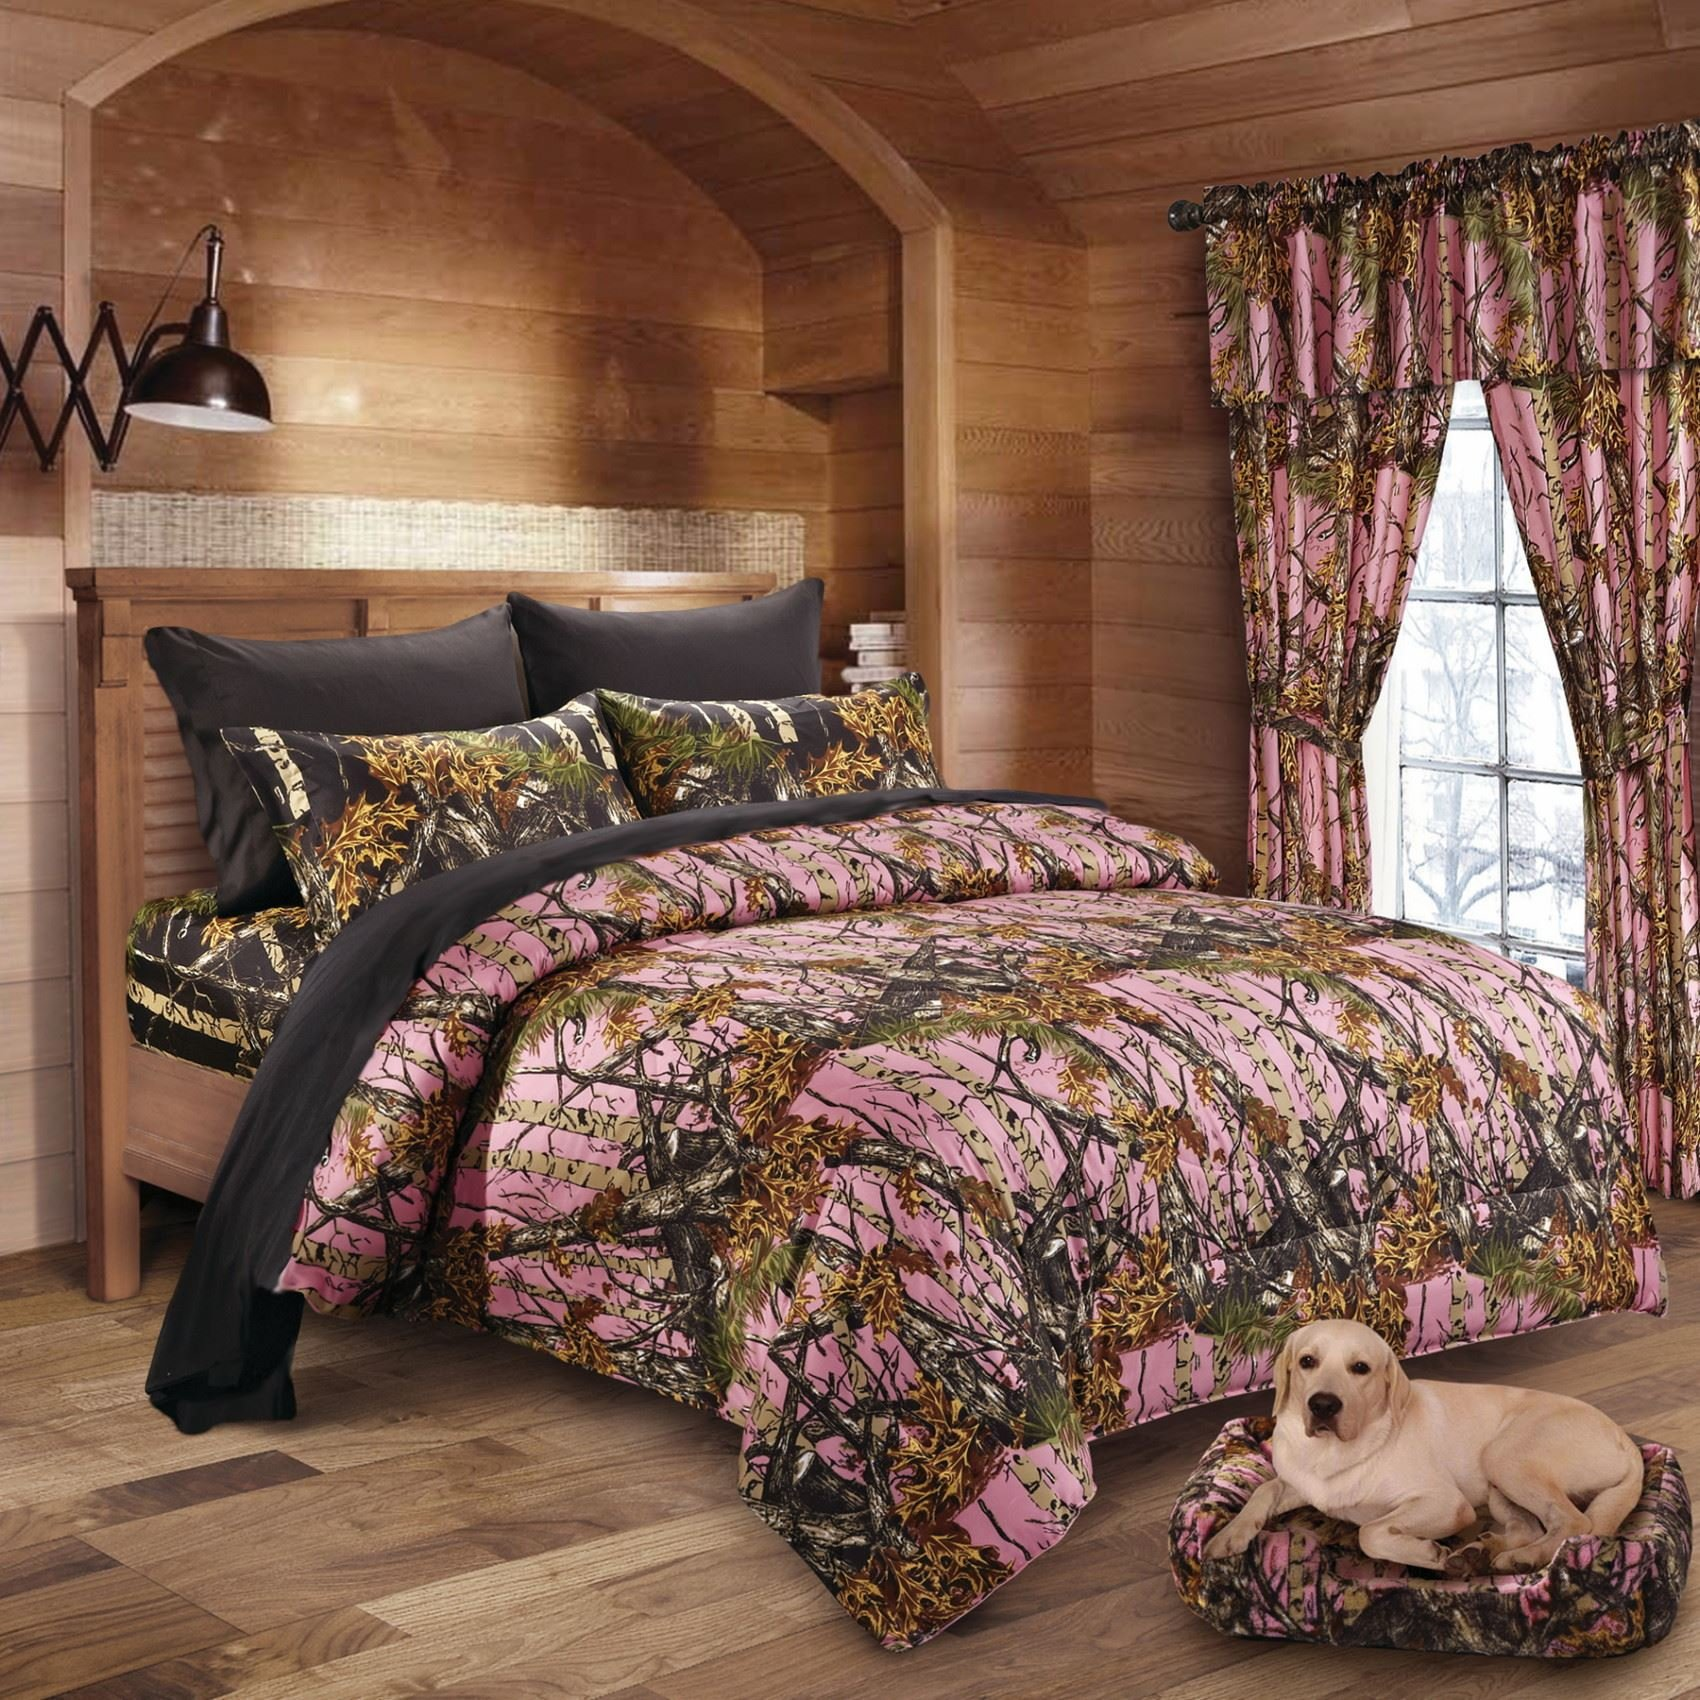 20 Lakes Woodland Hunter Camo Comforter, Sheet, Pillowcase Set (Twin, Pink & Black) by 20 Lakes (Image #1)